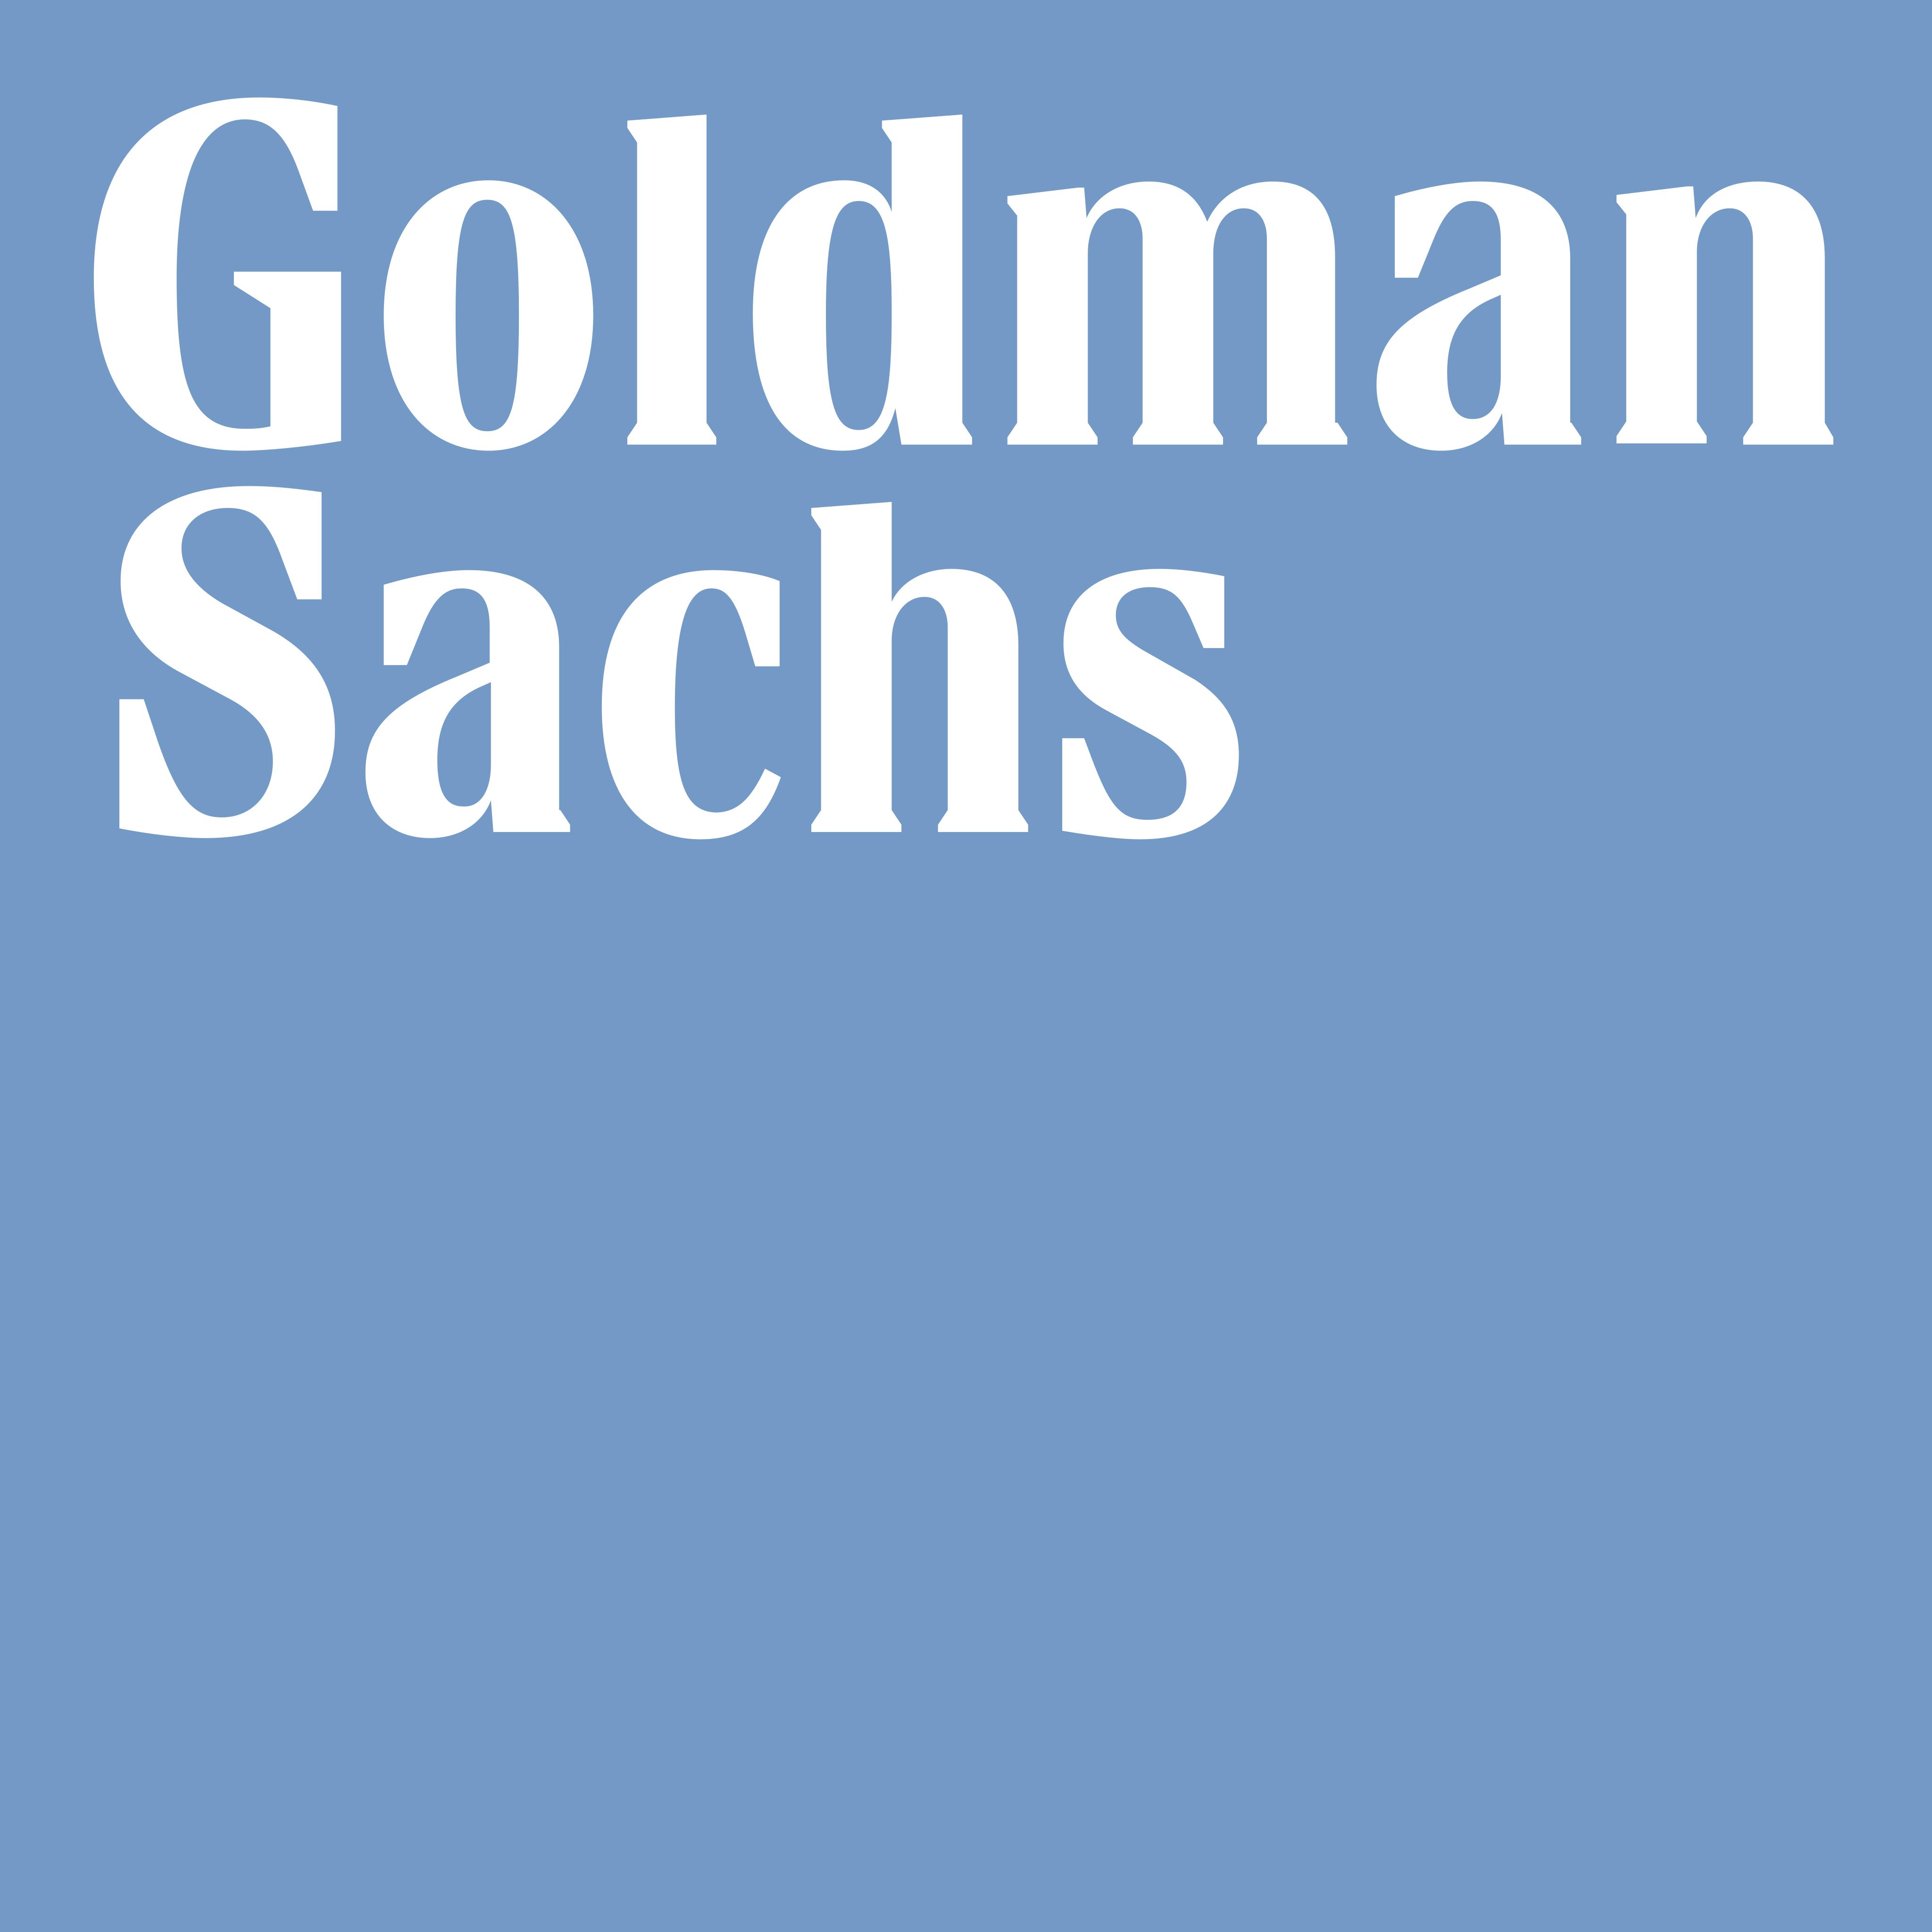 goldman sachs logo - Goldman Sachs Logo